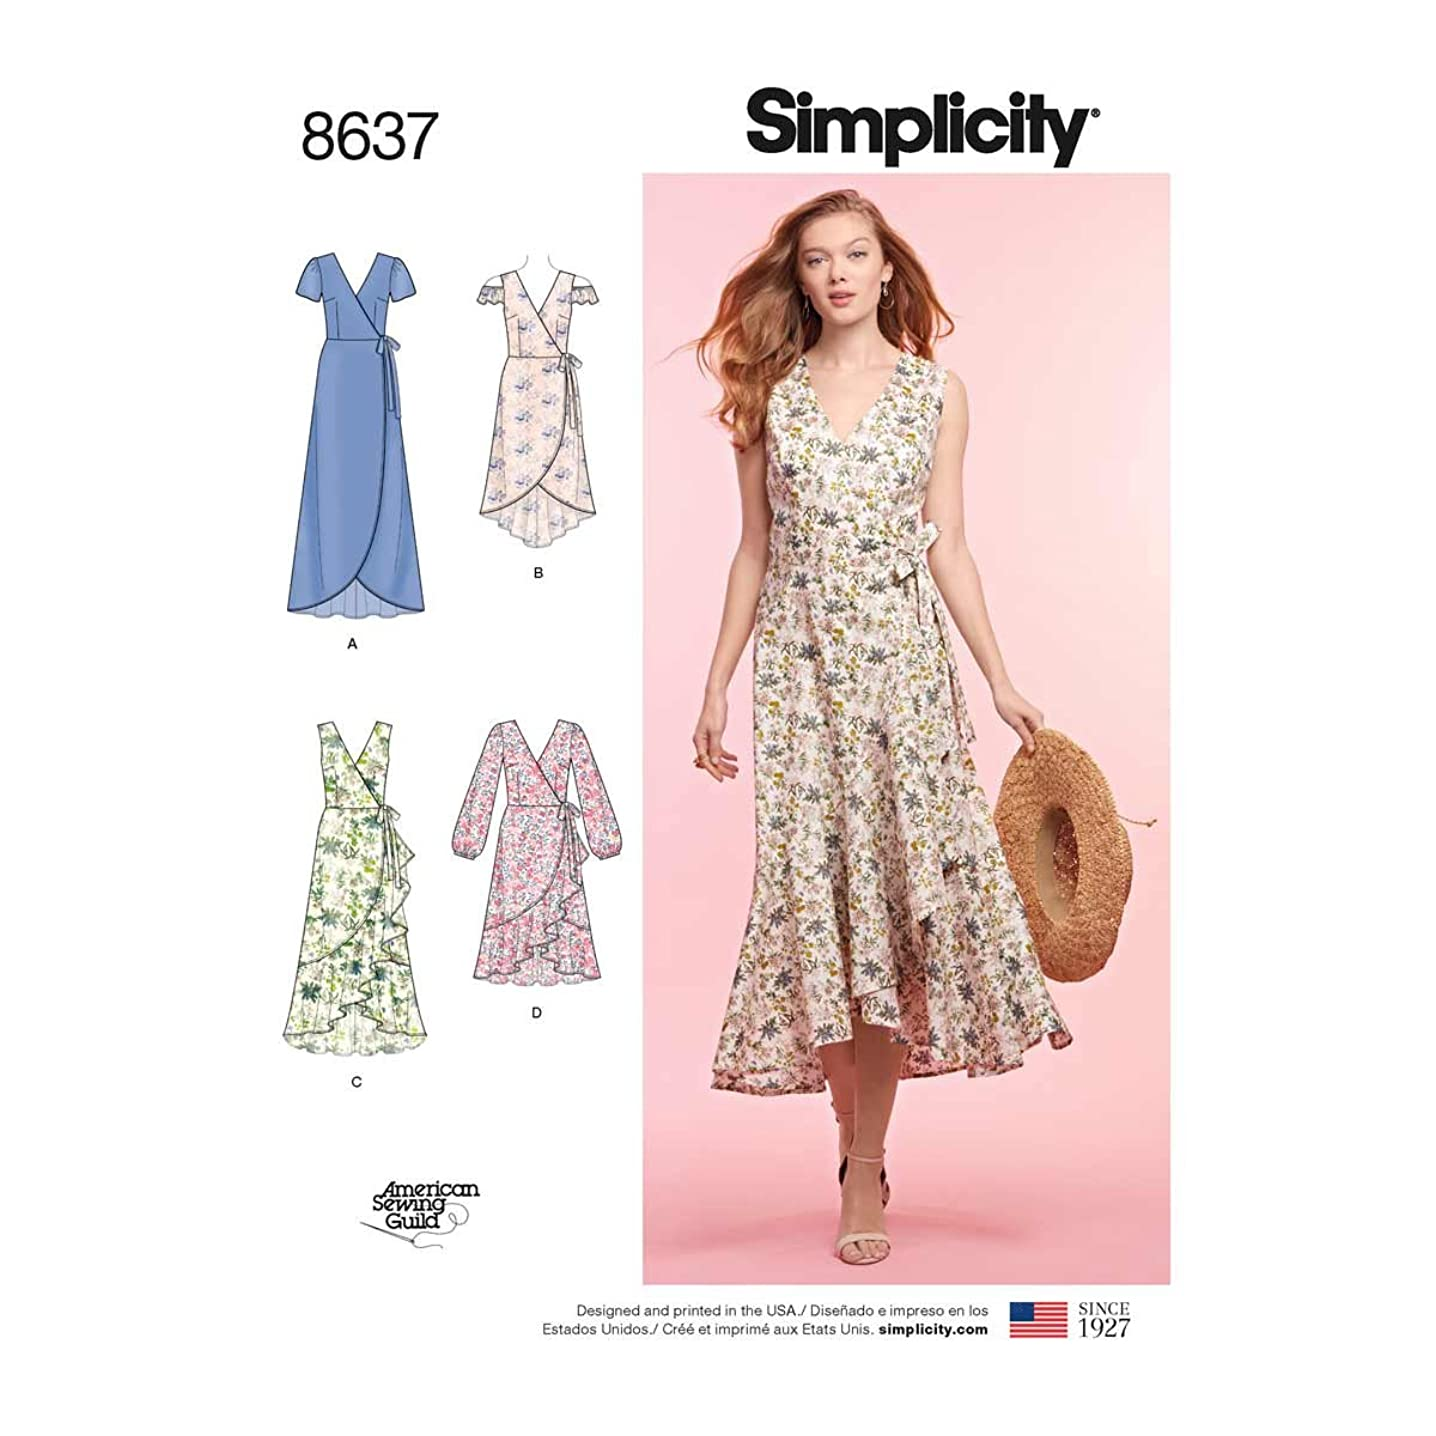 Simplicity Patterns US8637H5 Dresses, H5 (6-8-10-12-14)